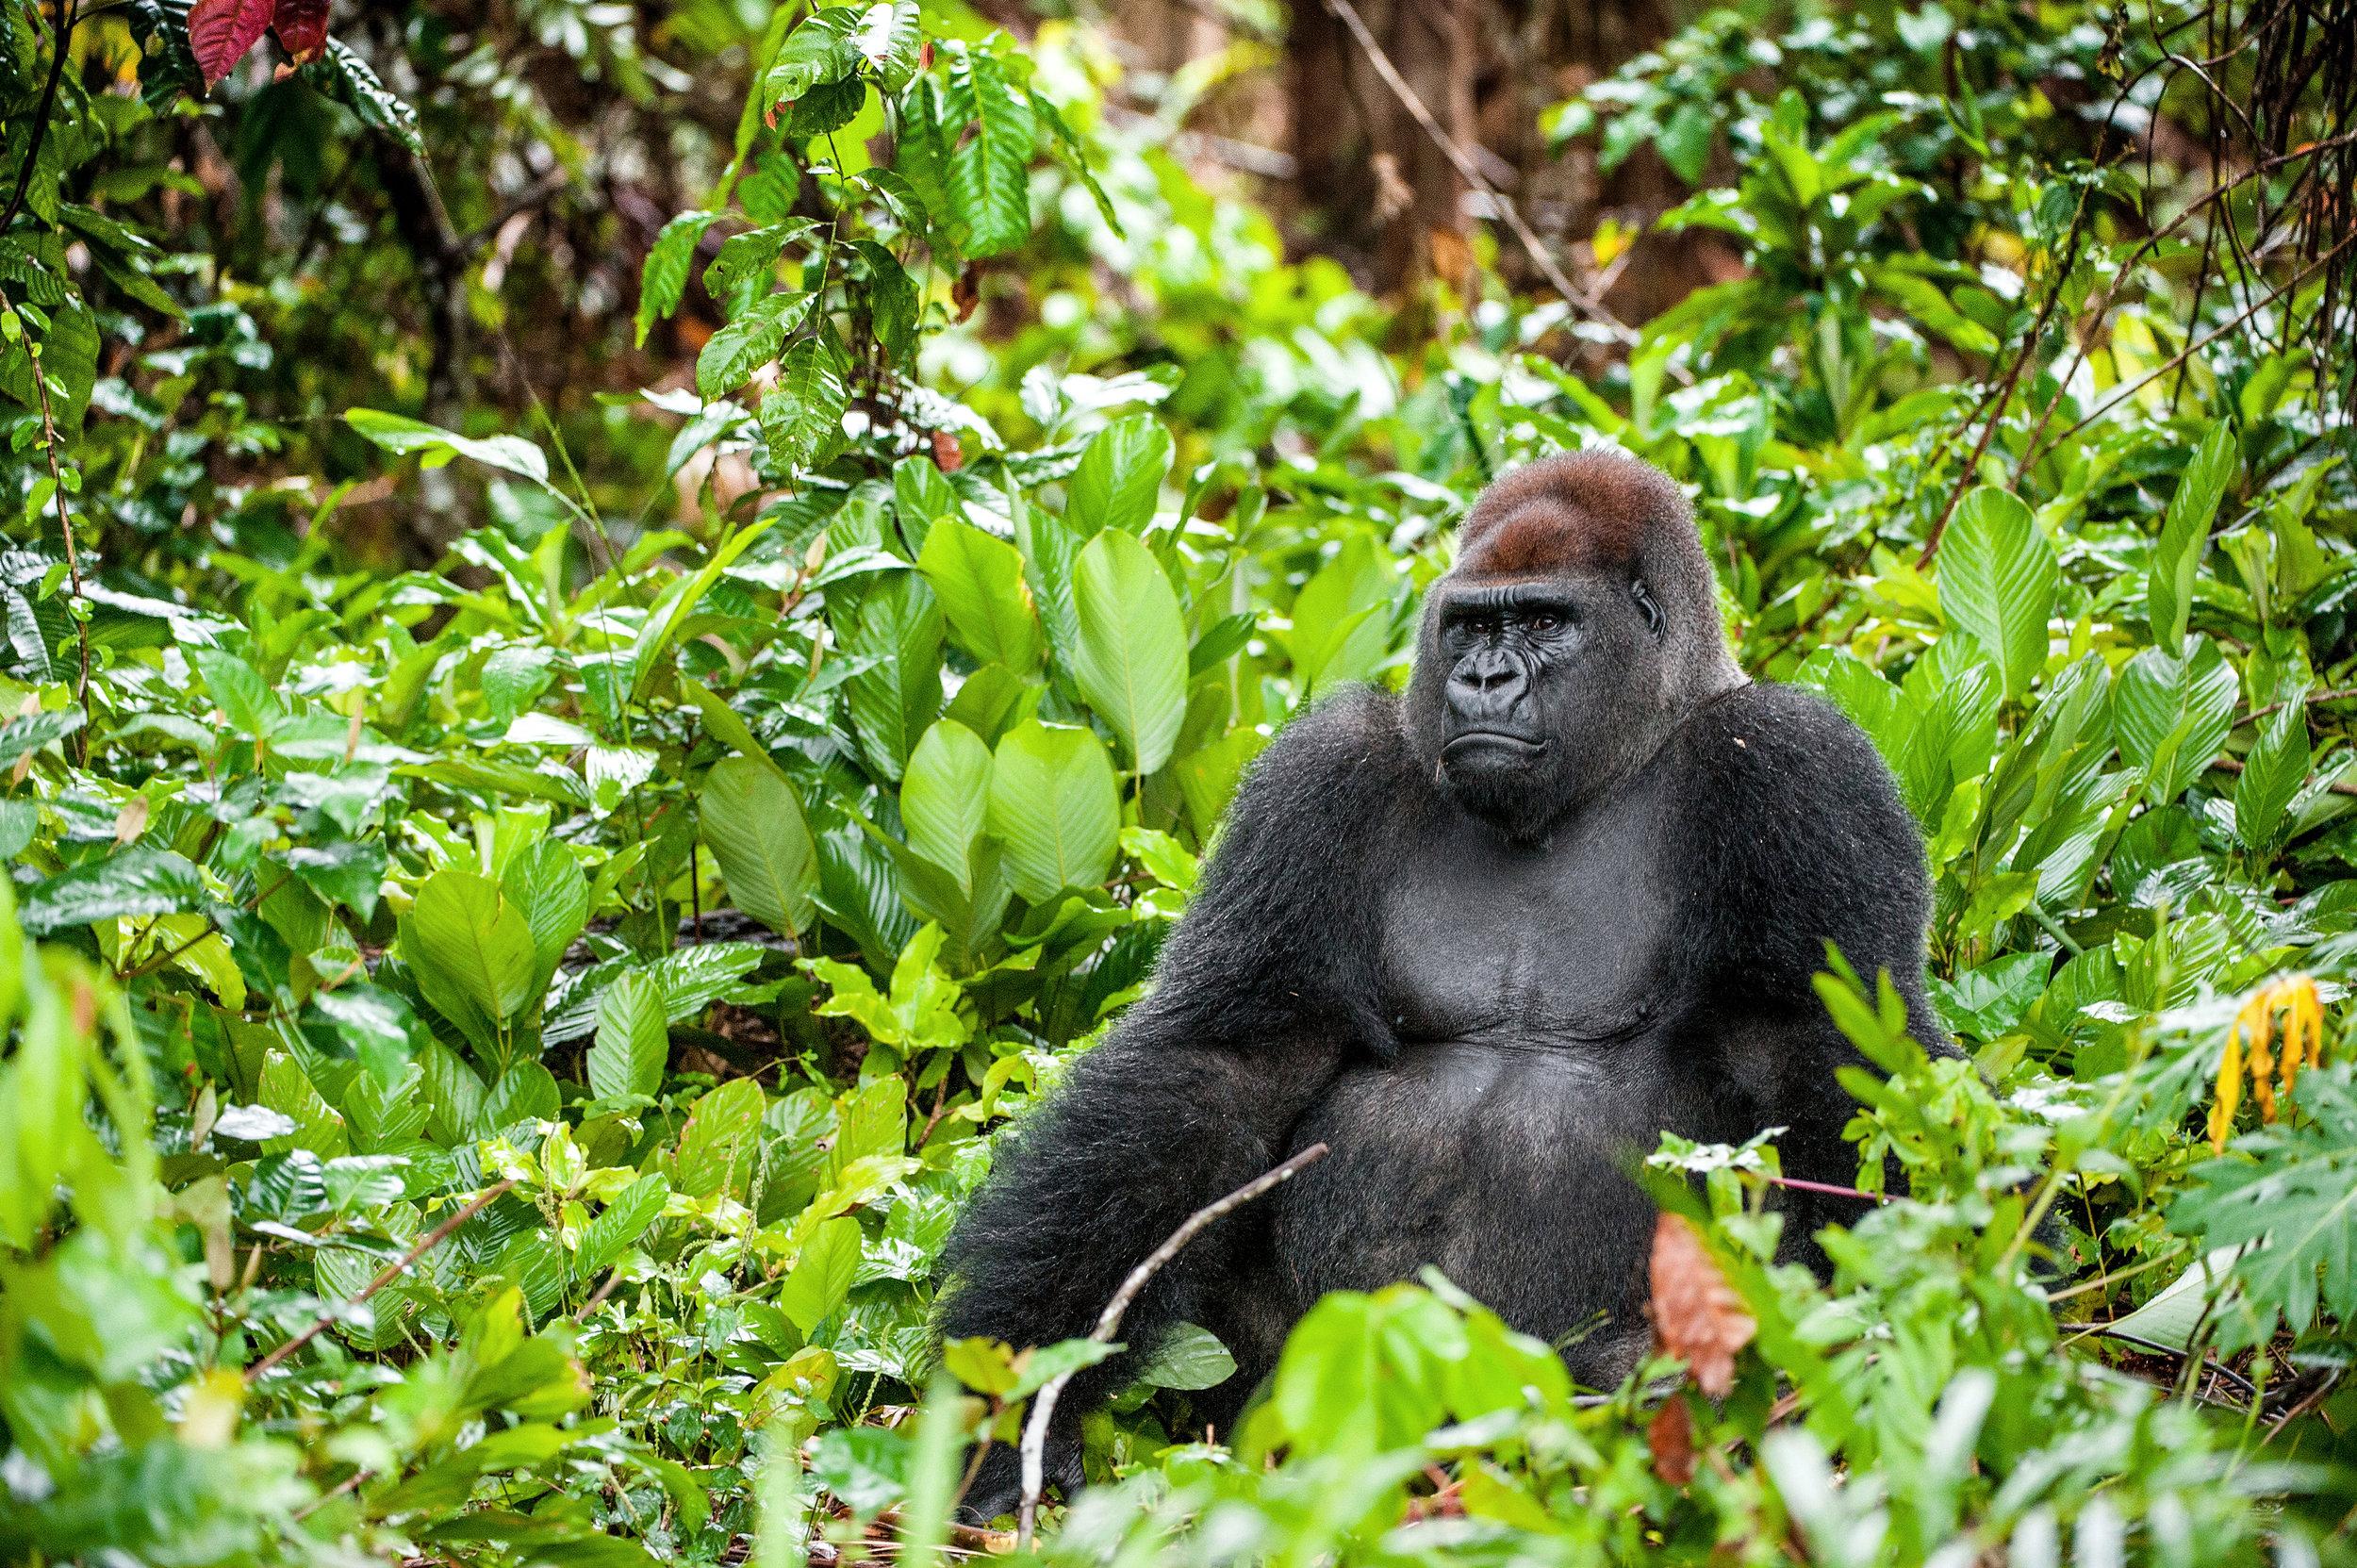 Portrait of a western lowland gorilla (Gorilla gorilla gorilla) close up at a short distance. Silverback - adult male of a gorilla in a native habitat.